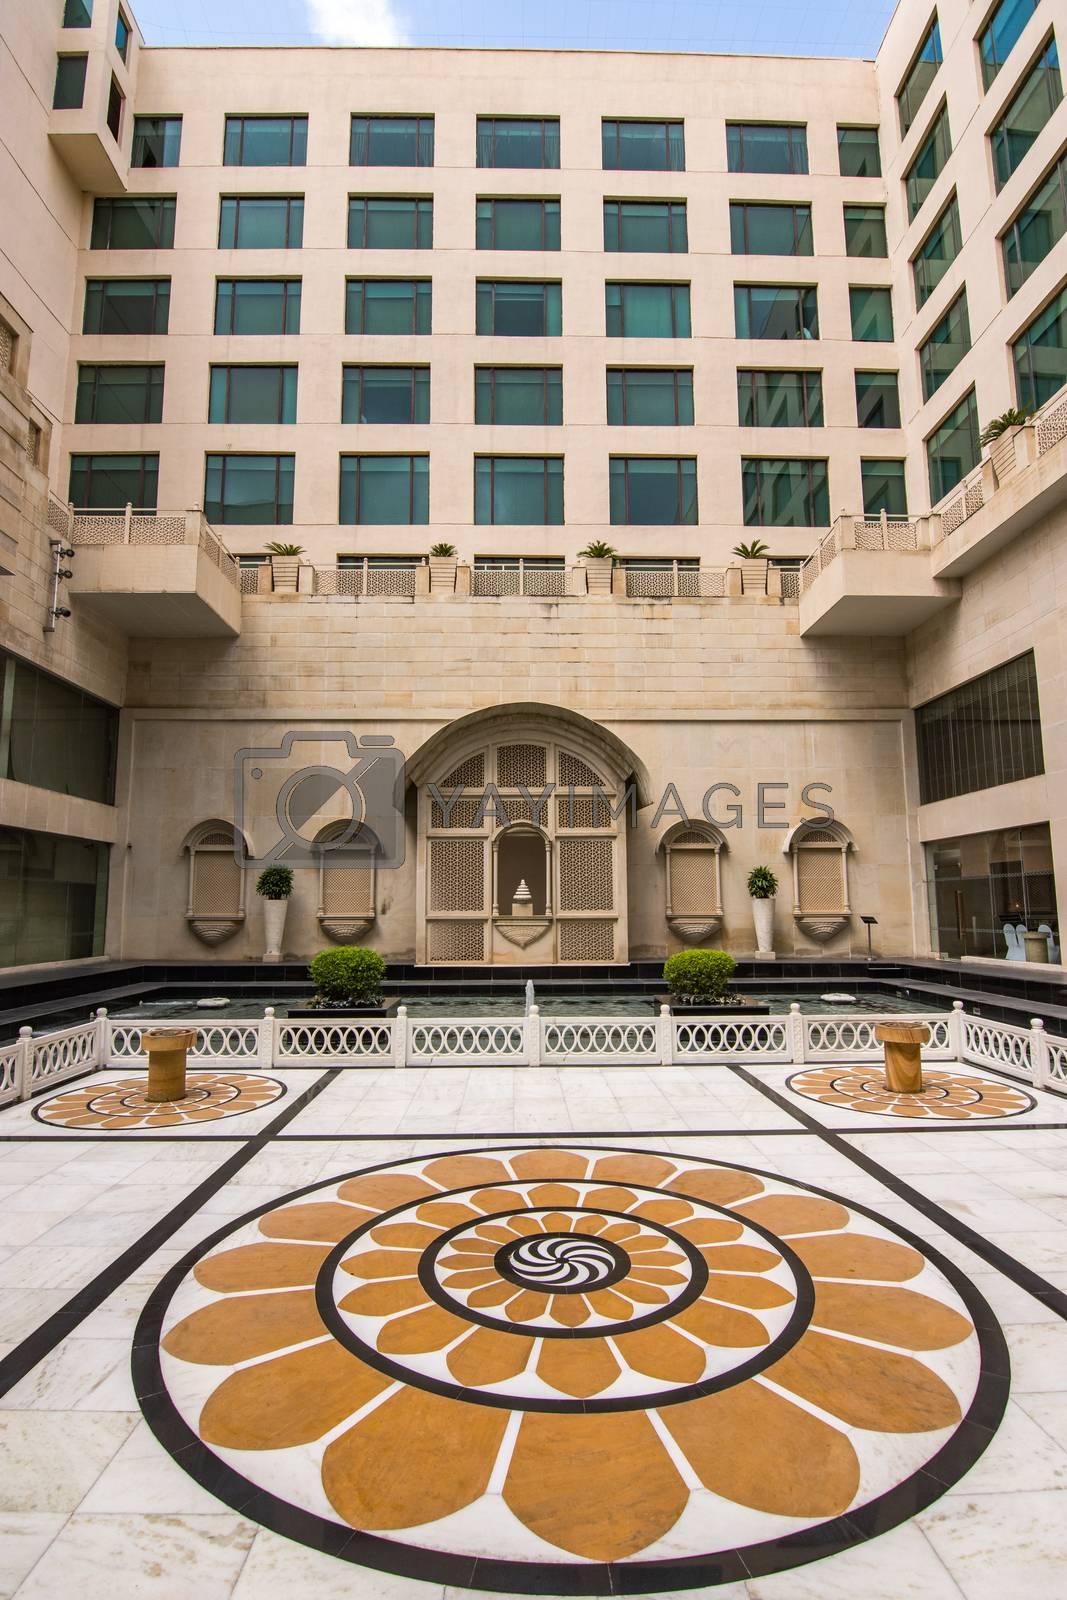 Jaipur, Rajasthan / India - September 28, 2019: The Lalit Jaipur, a 5-star luxury hotel in Jaipur, Rajasthan, India